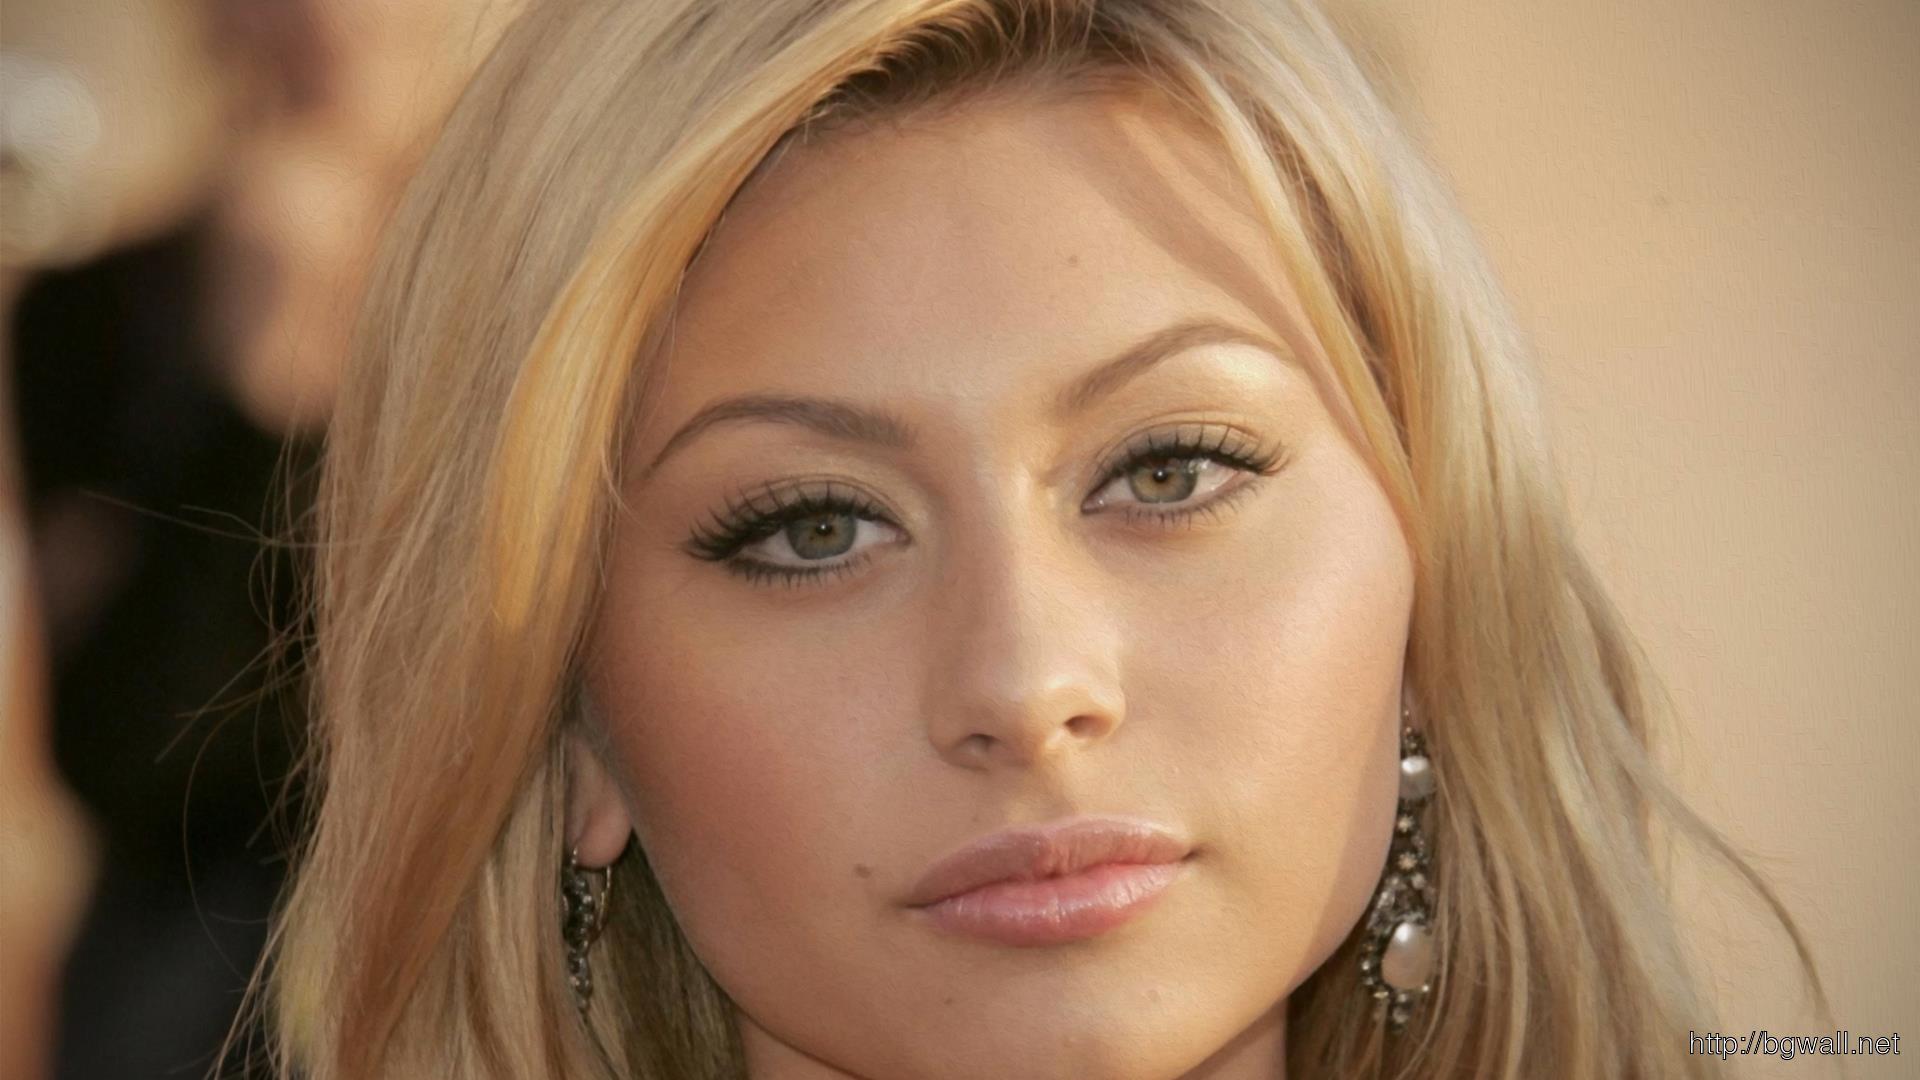 Aly Michalka Sad Face Closeup Wallpaper